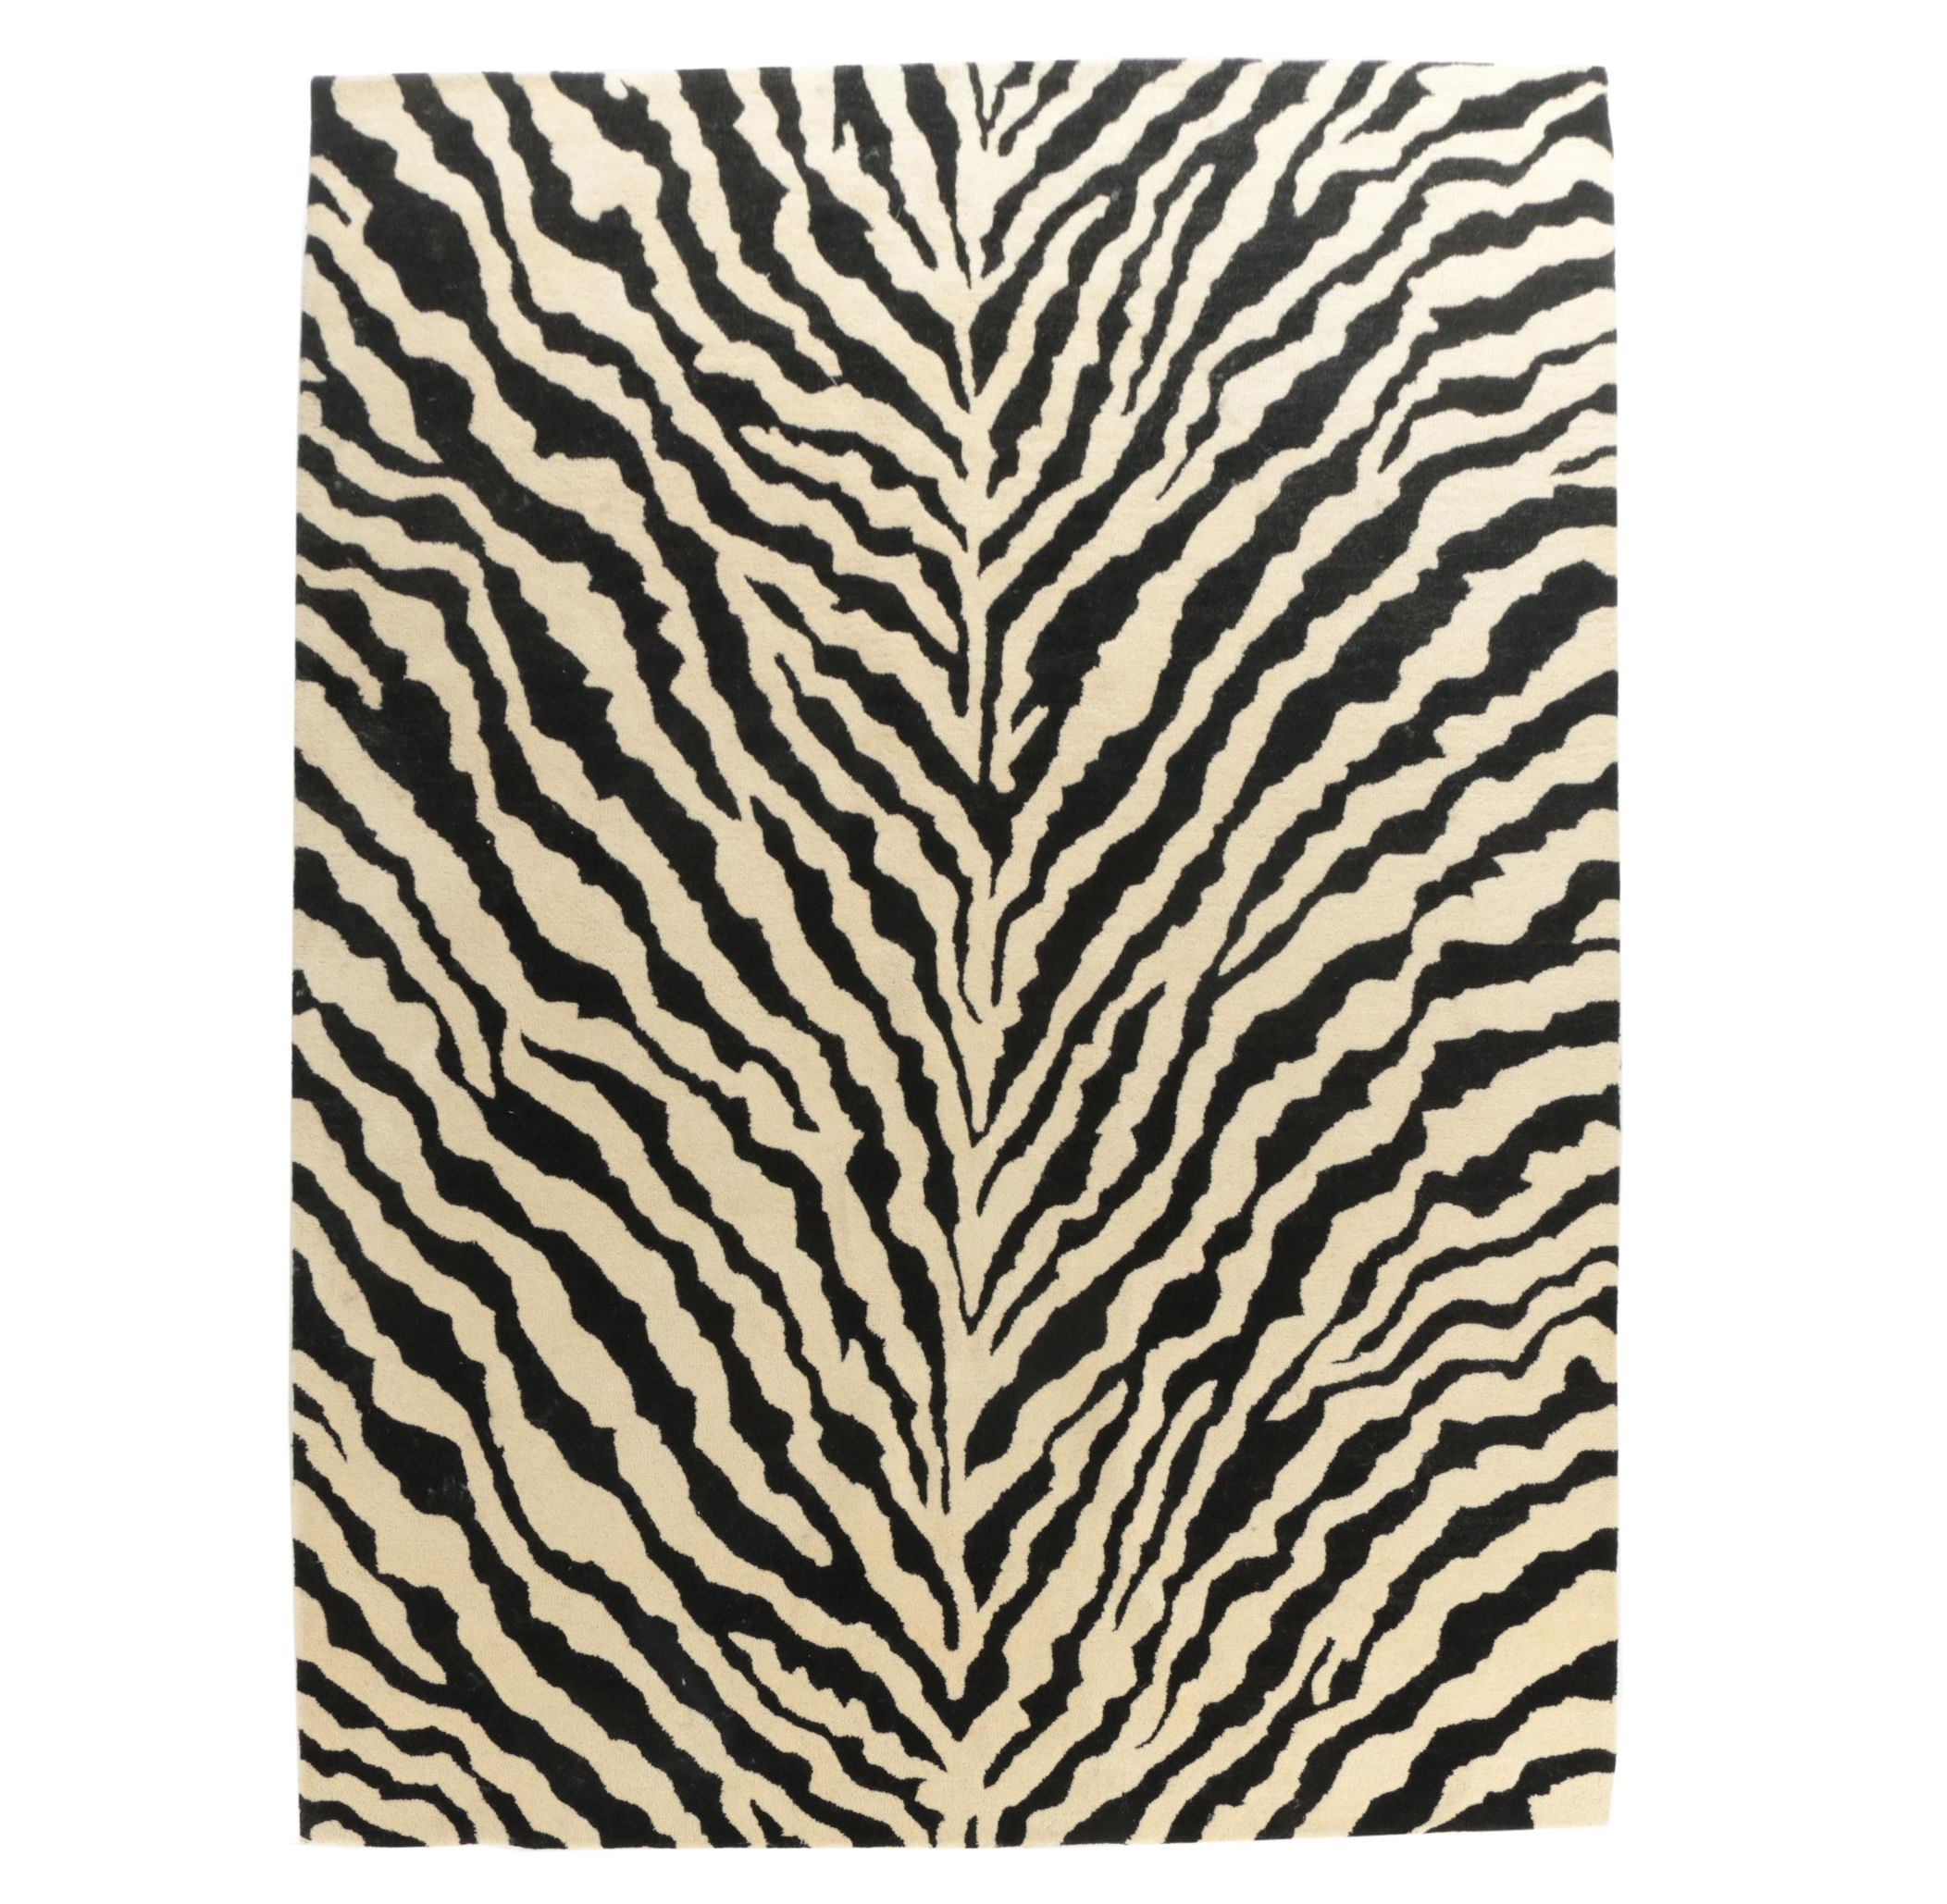 Hand-Tufted Zebra-Stripe Indian Wool Area Rug